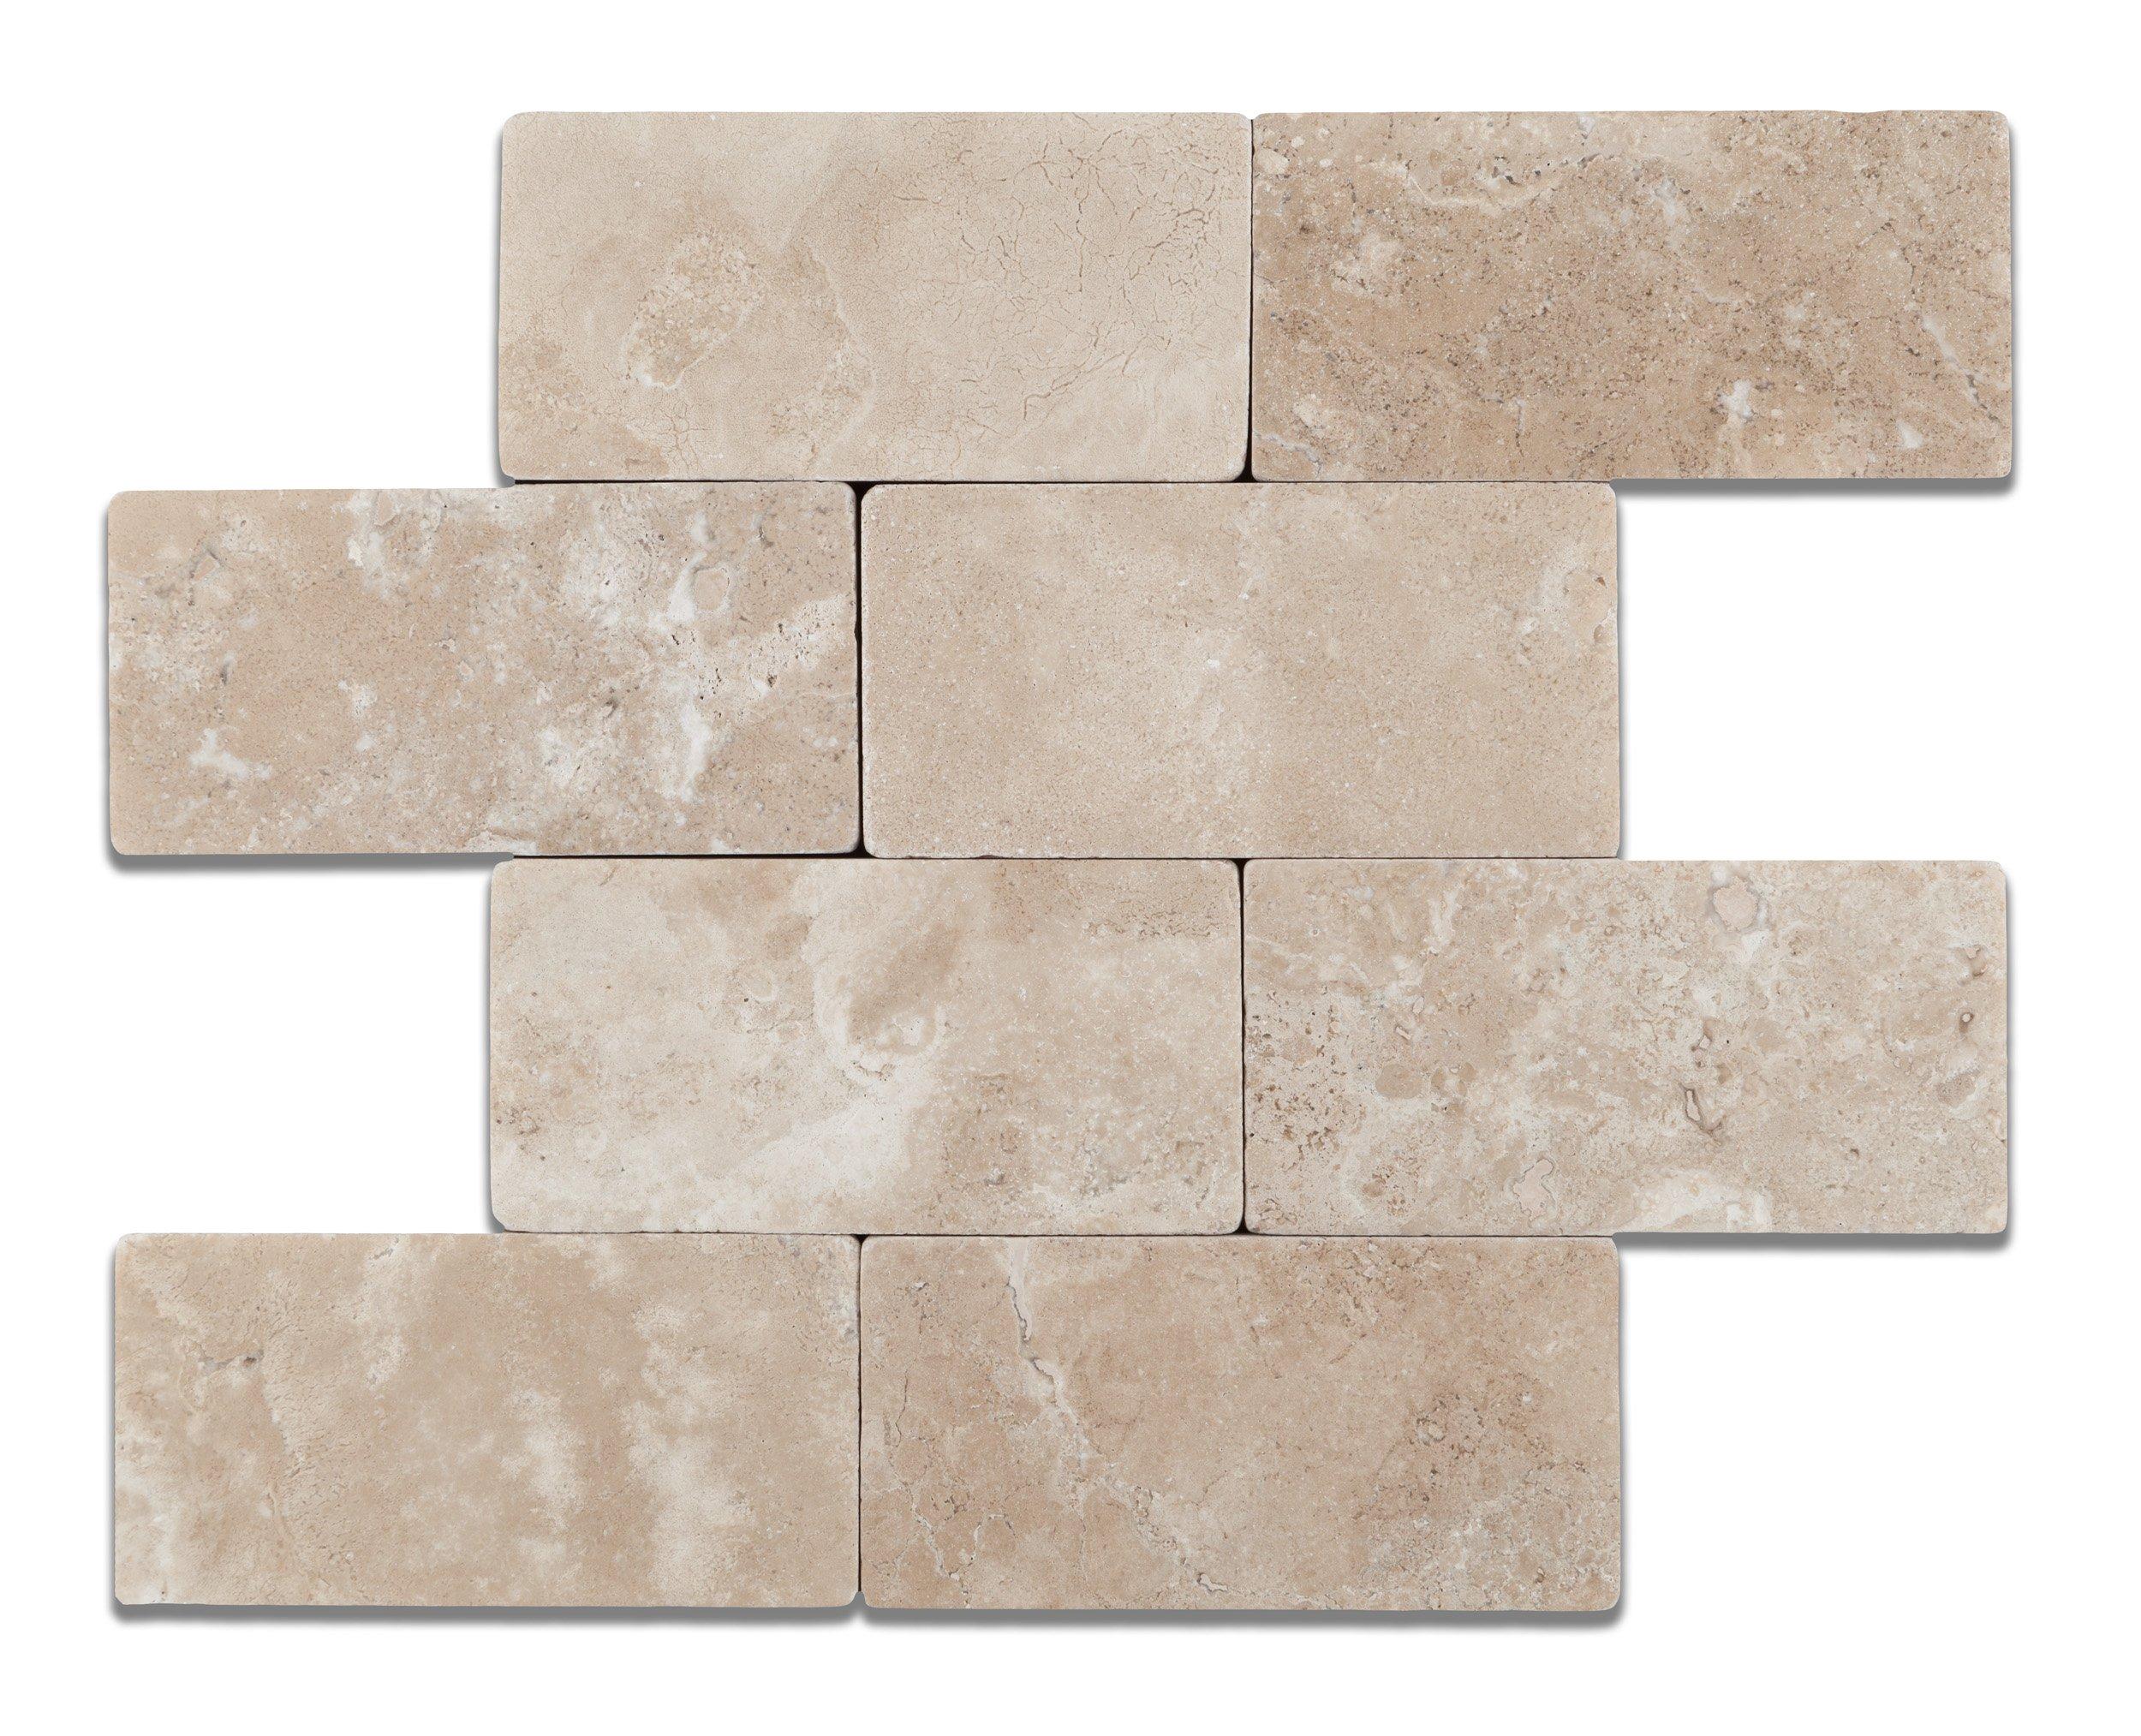 Durango Cream (Paredon) Travertine 3 X 6 Subway Field Tile, Tumbled - Lot of 50 sq. ft.